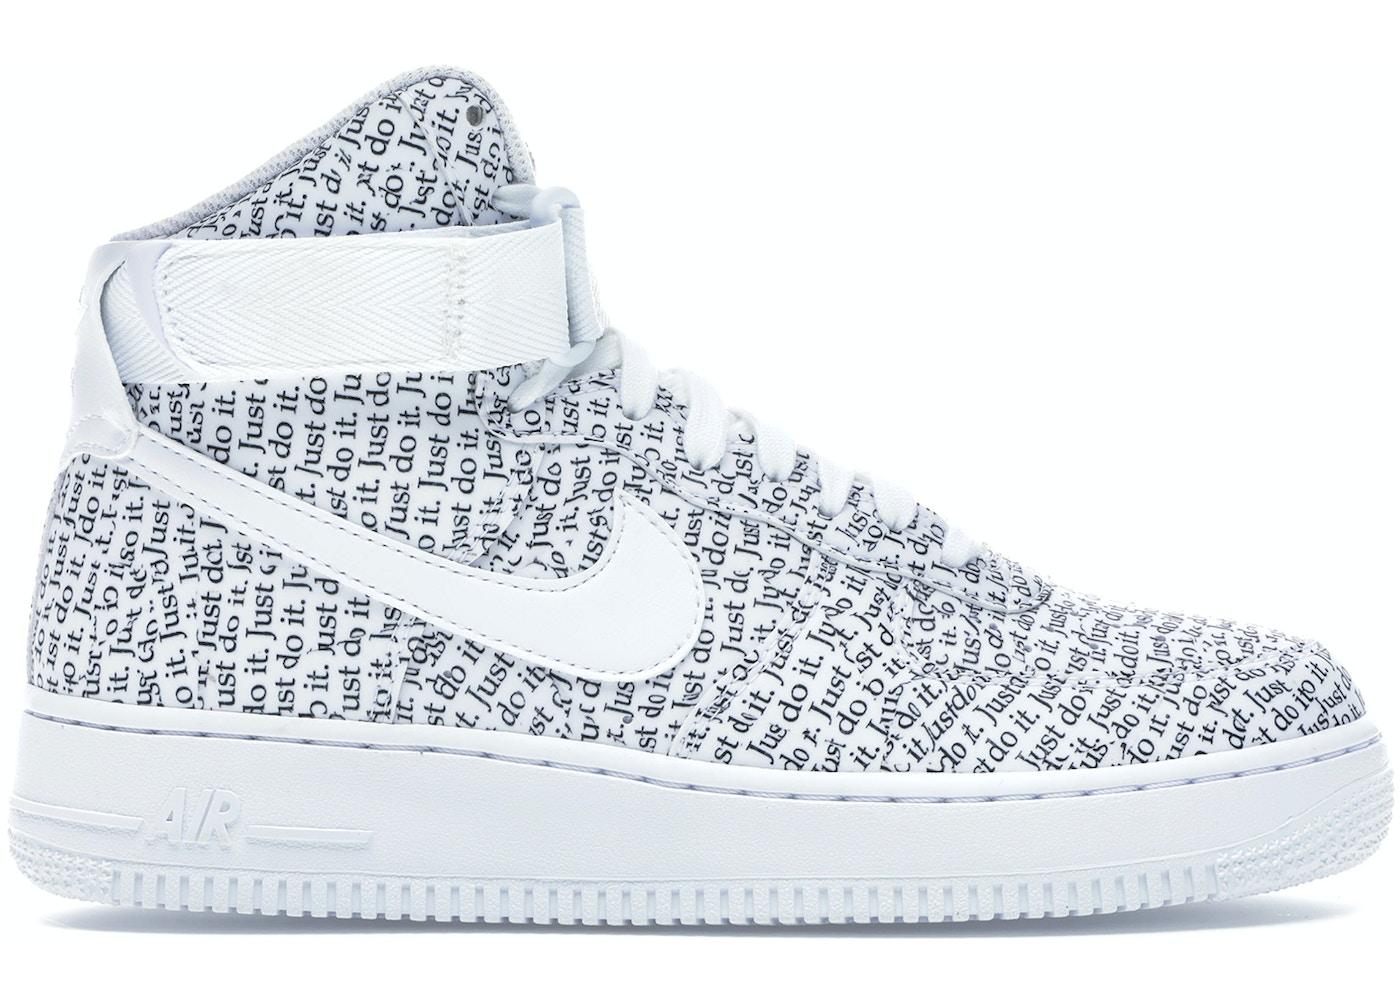 Interacción tornillo esposa  Nike Air Force 1 High Just Do It Pack White (W) - AO5138-100